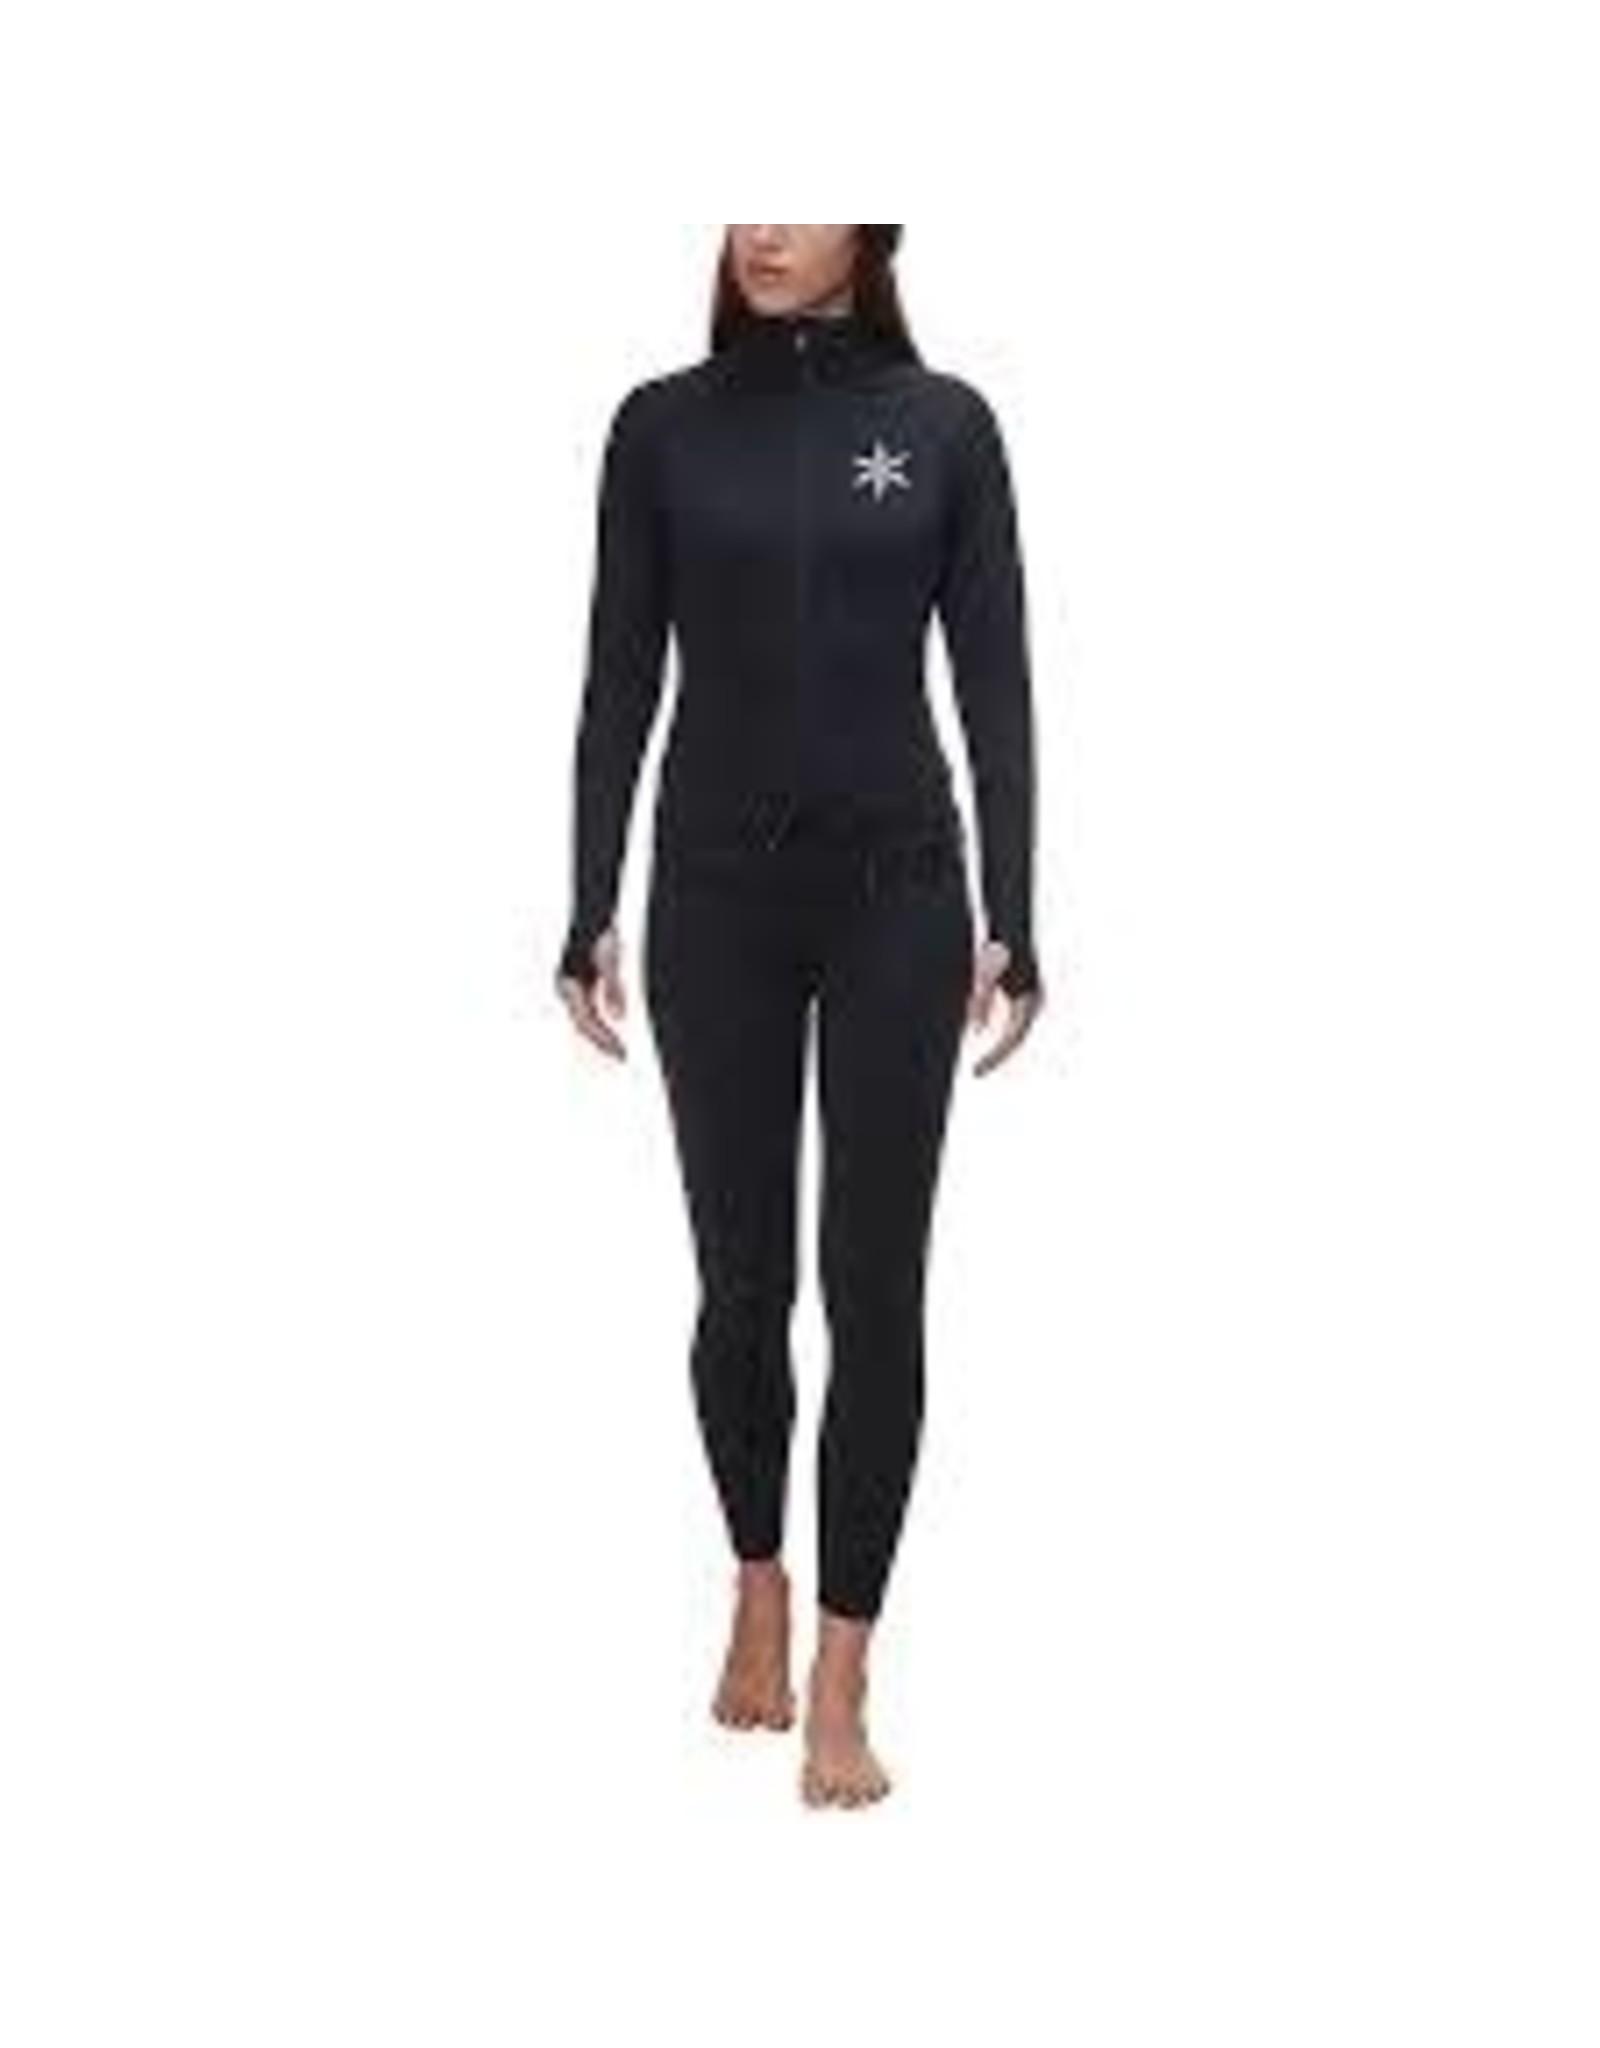 airblaster Airblaster - sous-vêtement classic ninja suit